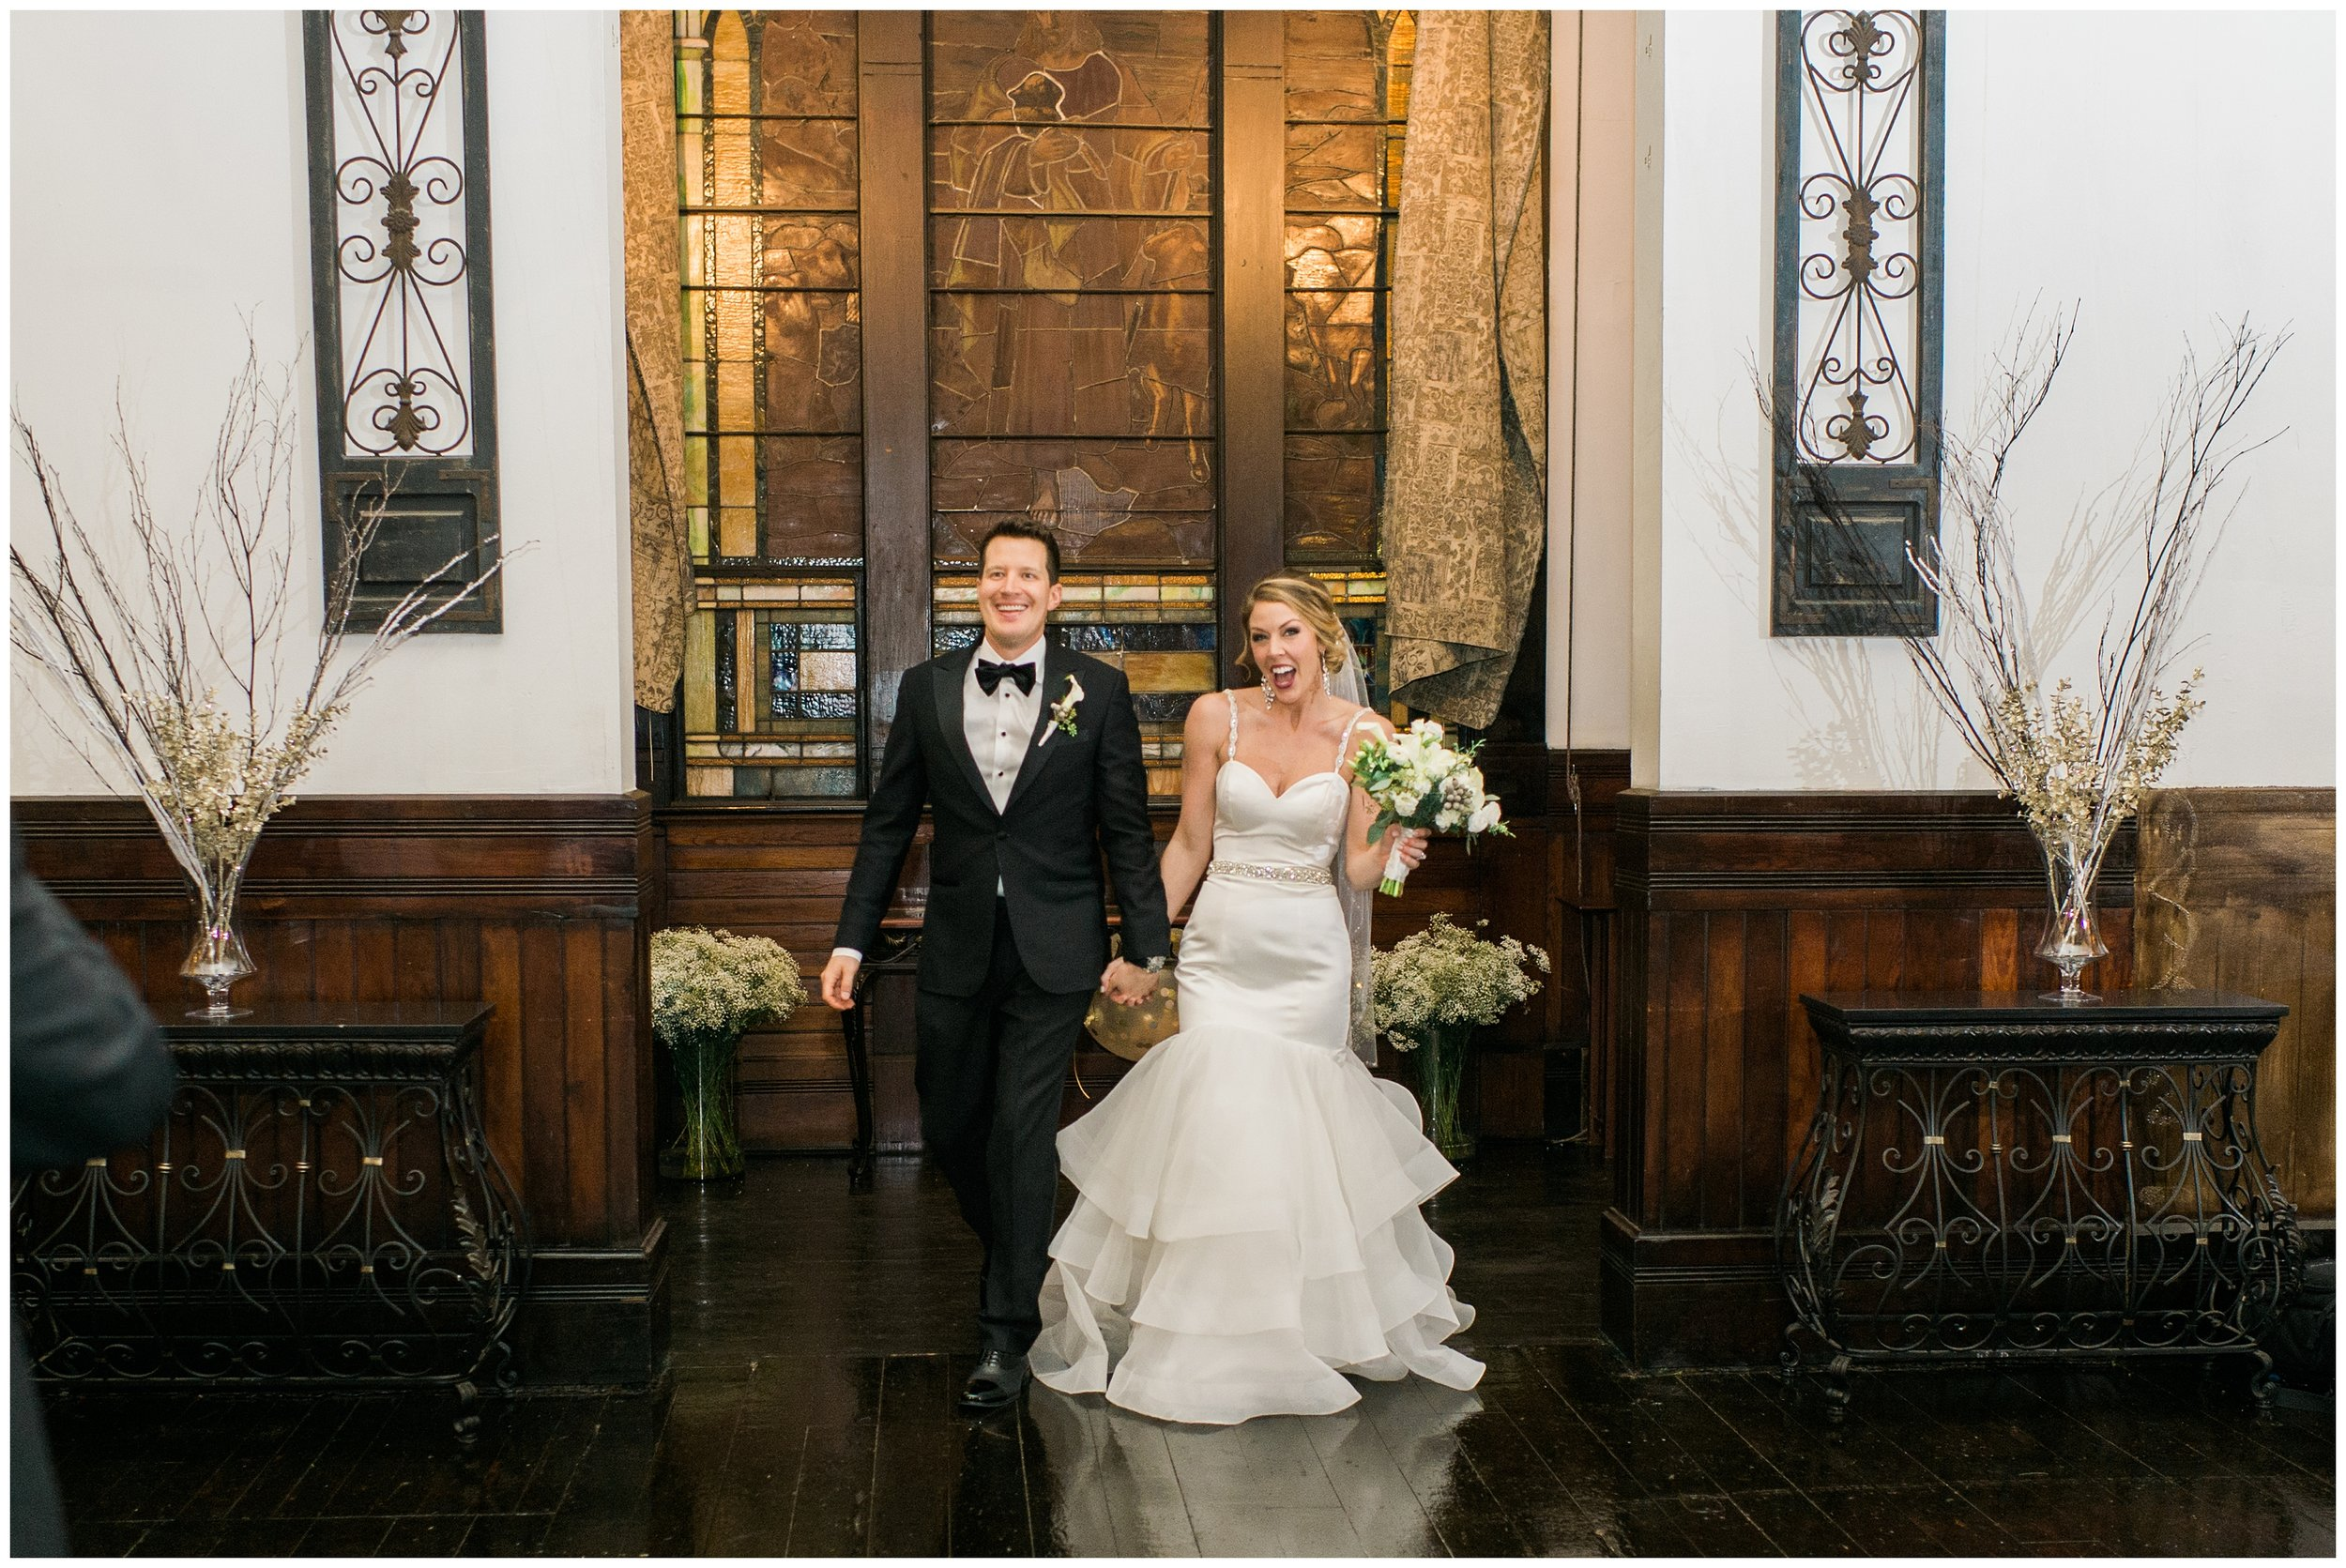 Rebecca_Bridges_Photography_Indianapolis_Wedding_Photographer_5841.jpg